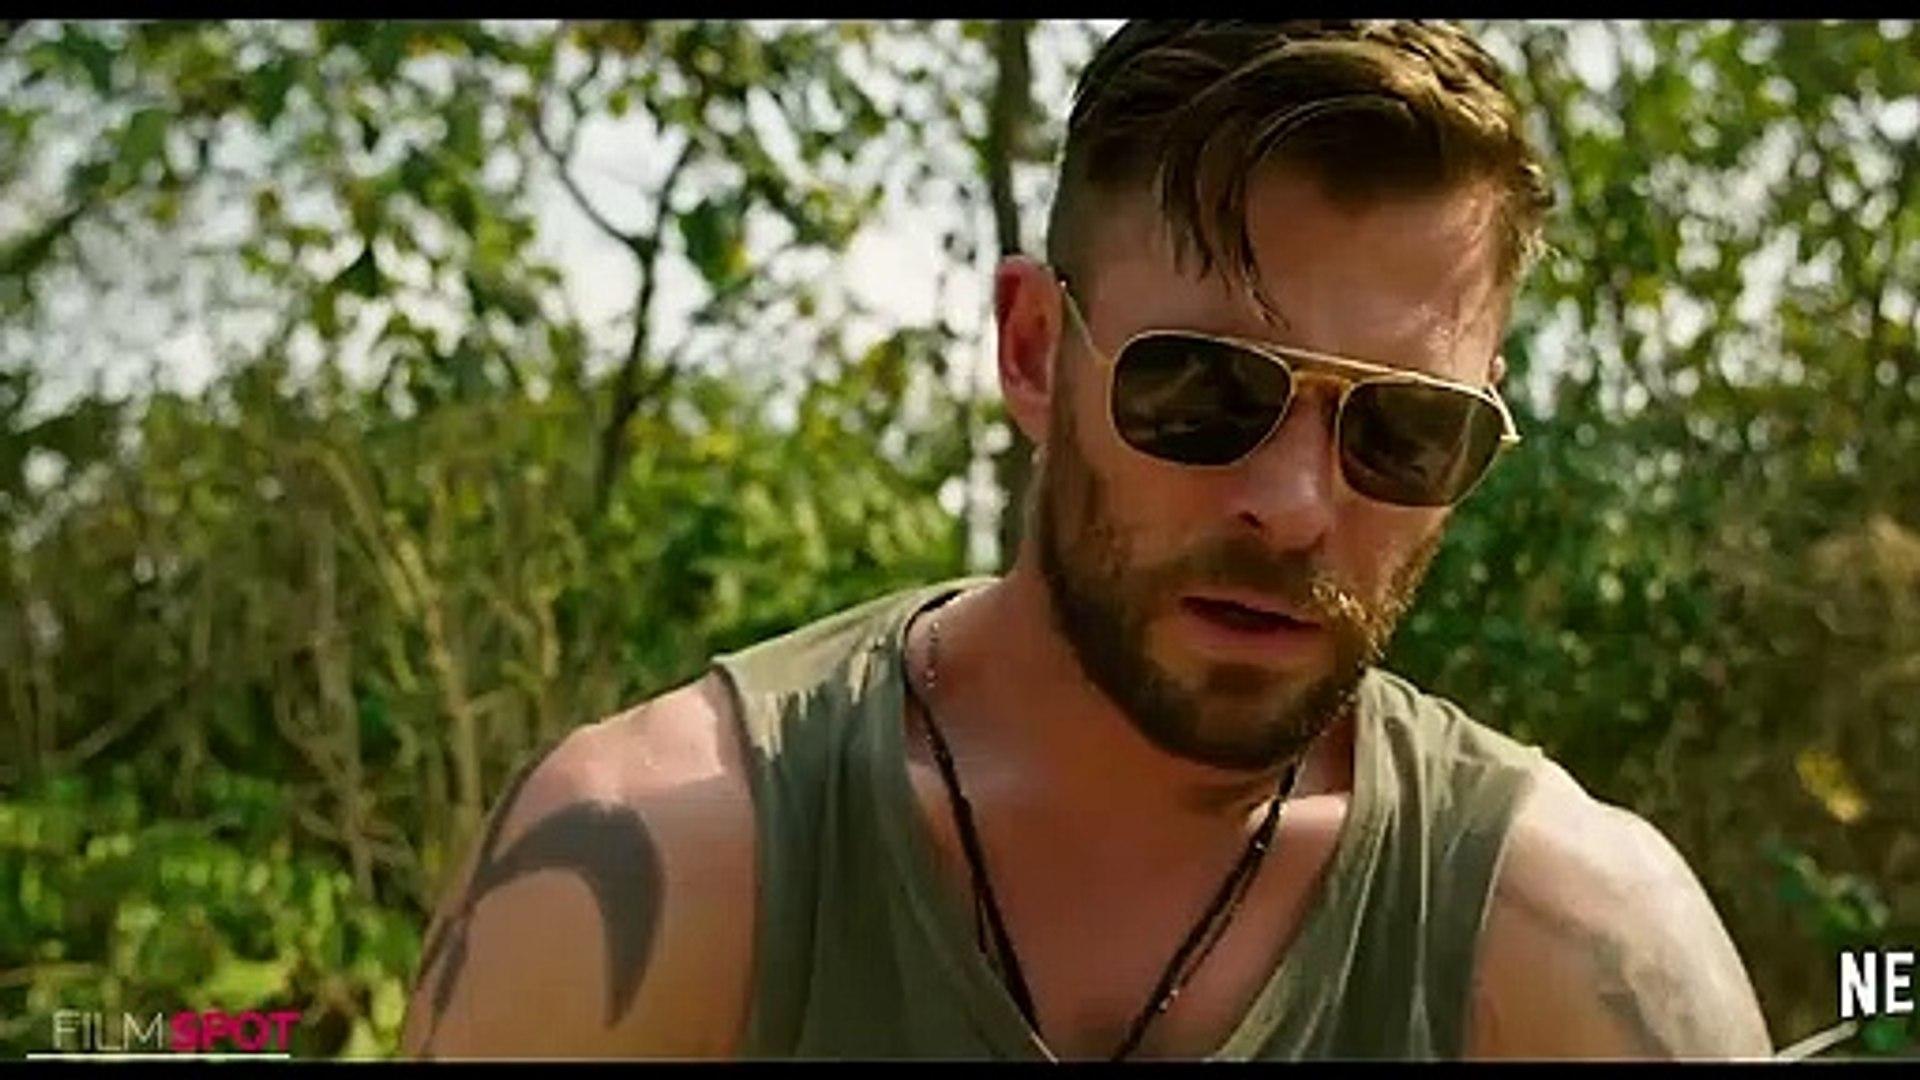 Chris Hemsworth Gun Fight Scene Extraction New 2020 Movie Clip 4k Video Dailymotion